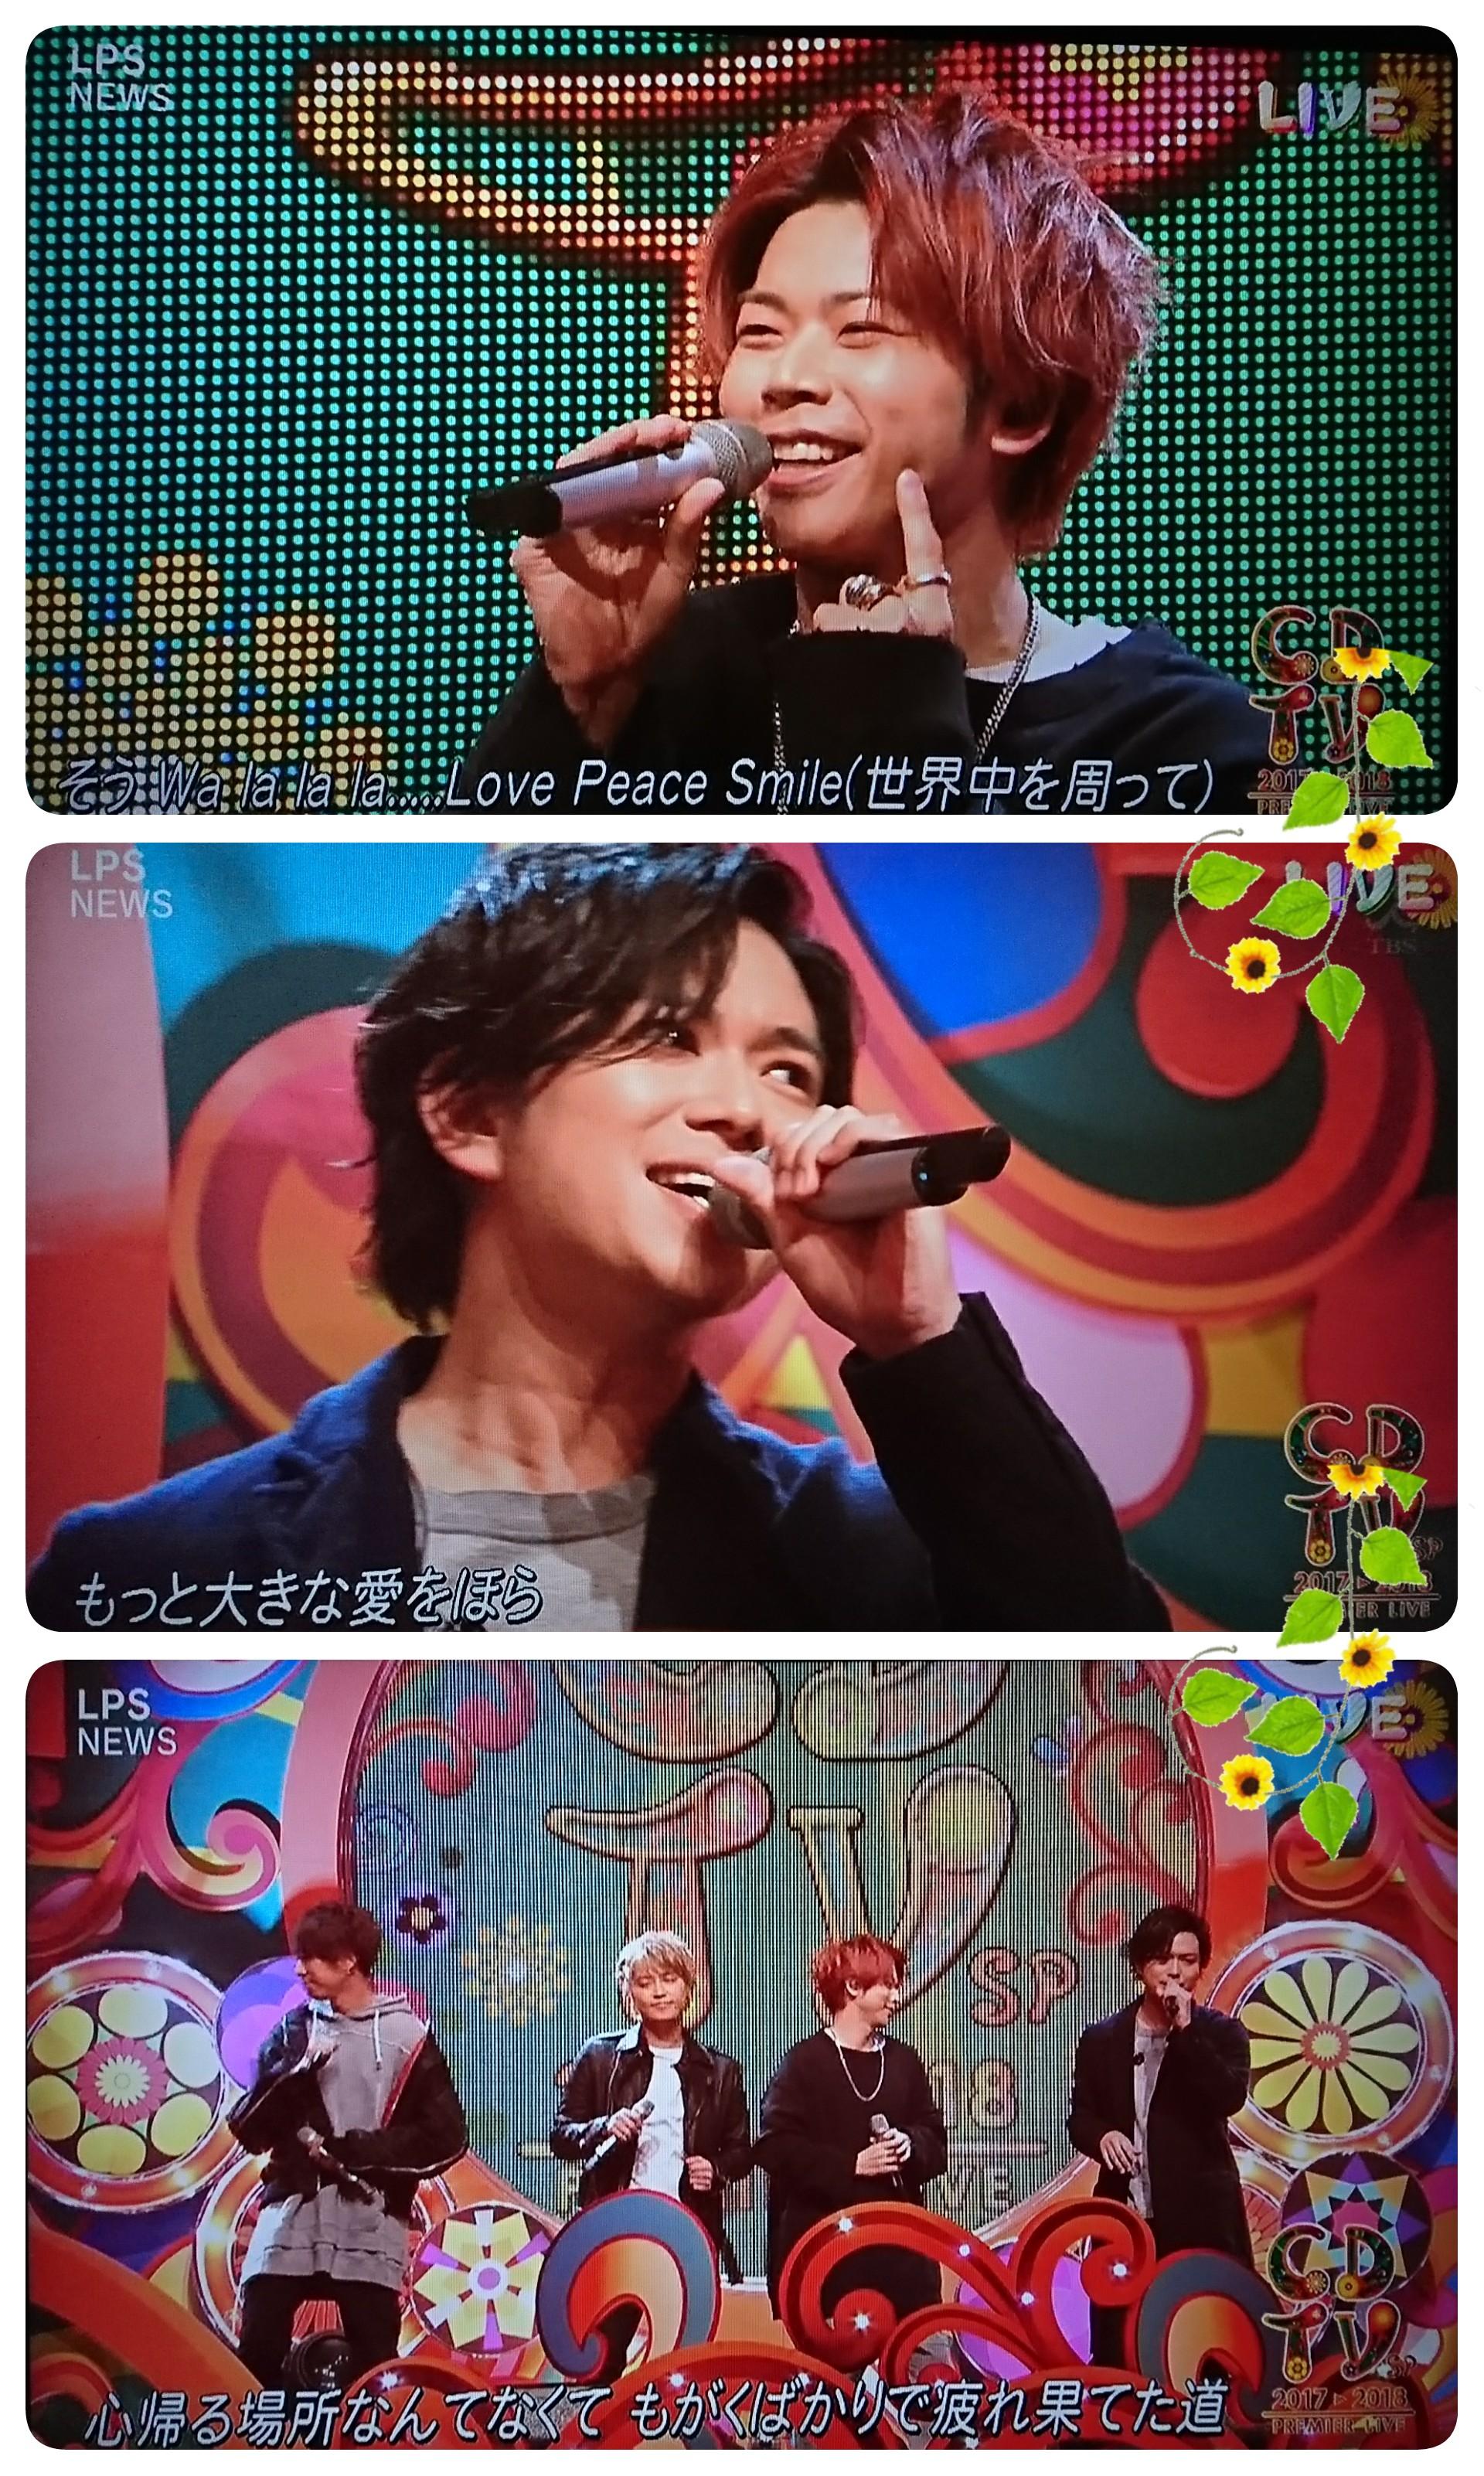 f:id:sunflower-shigeaki:20180106002012j:image